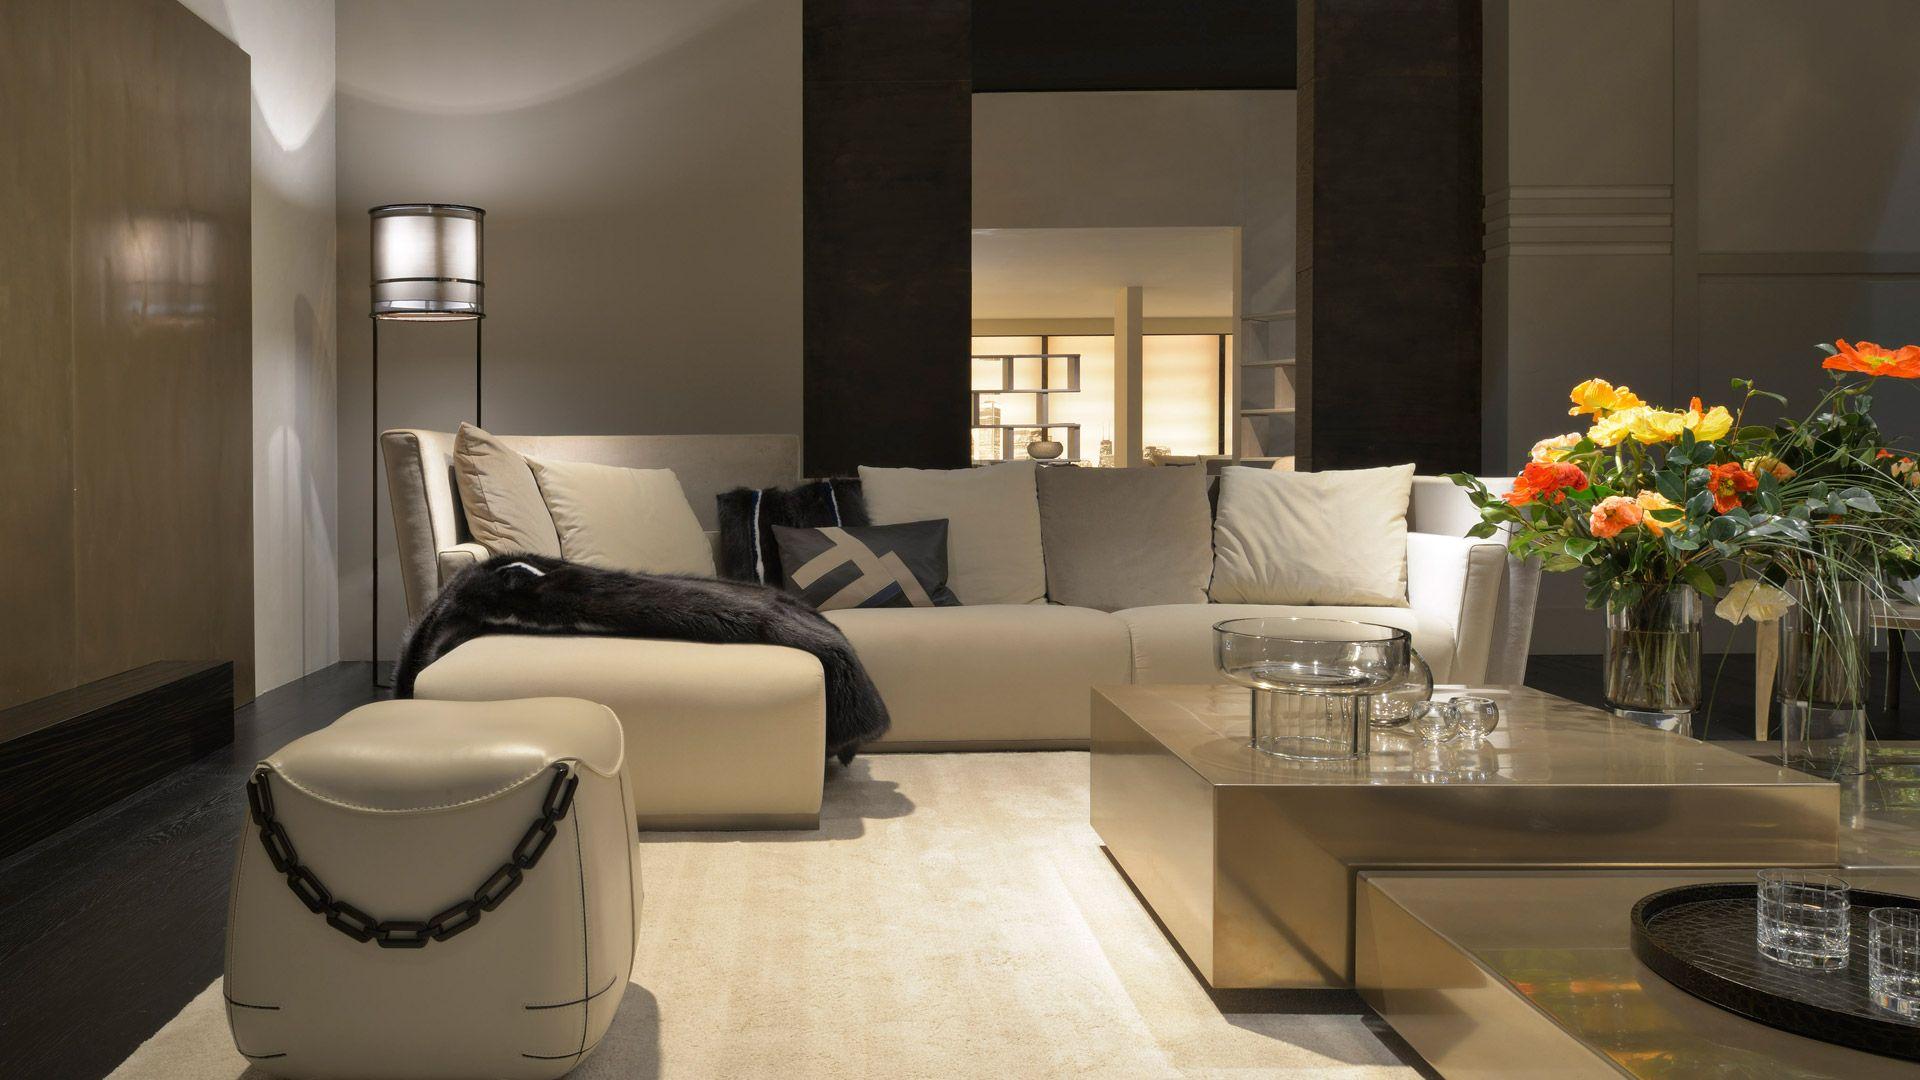 @Fendicasa Living Room. Xo, Kasia Www.kasiasworldofrealestate.com